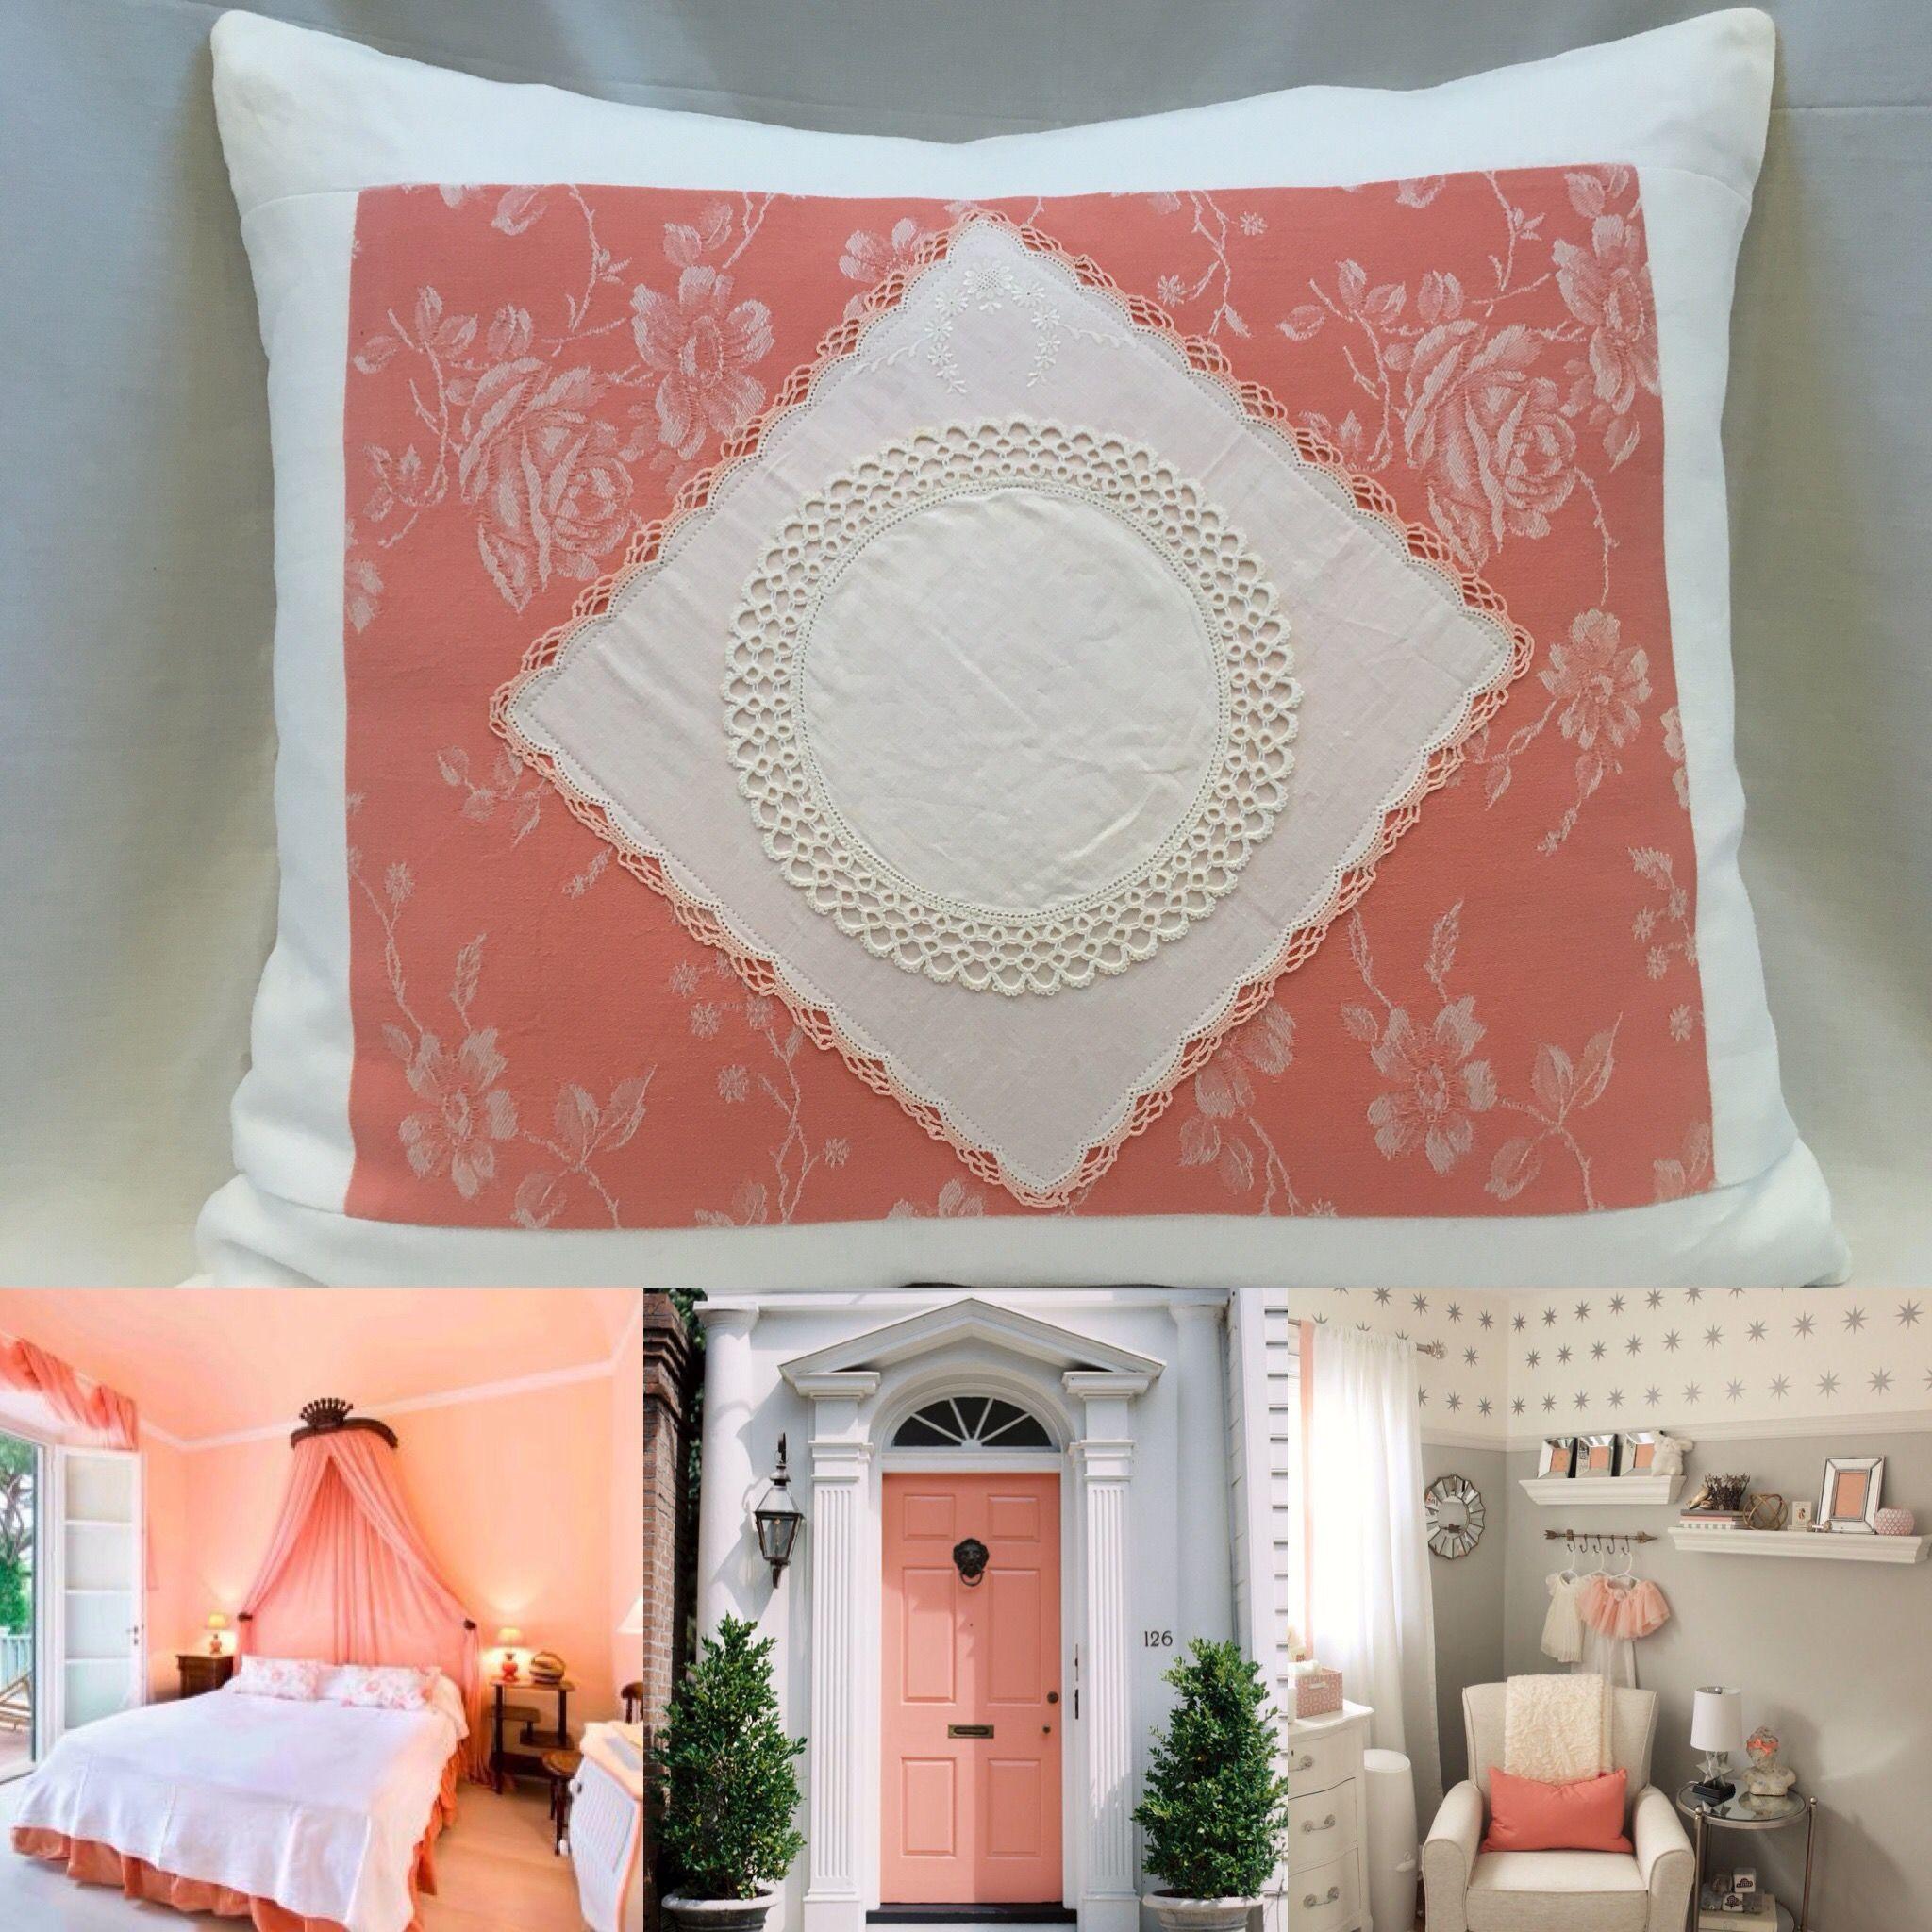 box pillow code february coupon subscription sprezzabox girl january pillows com meets review